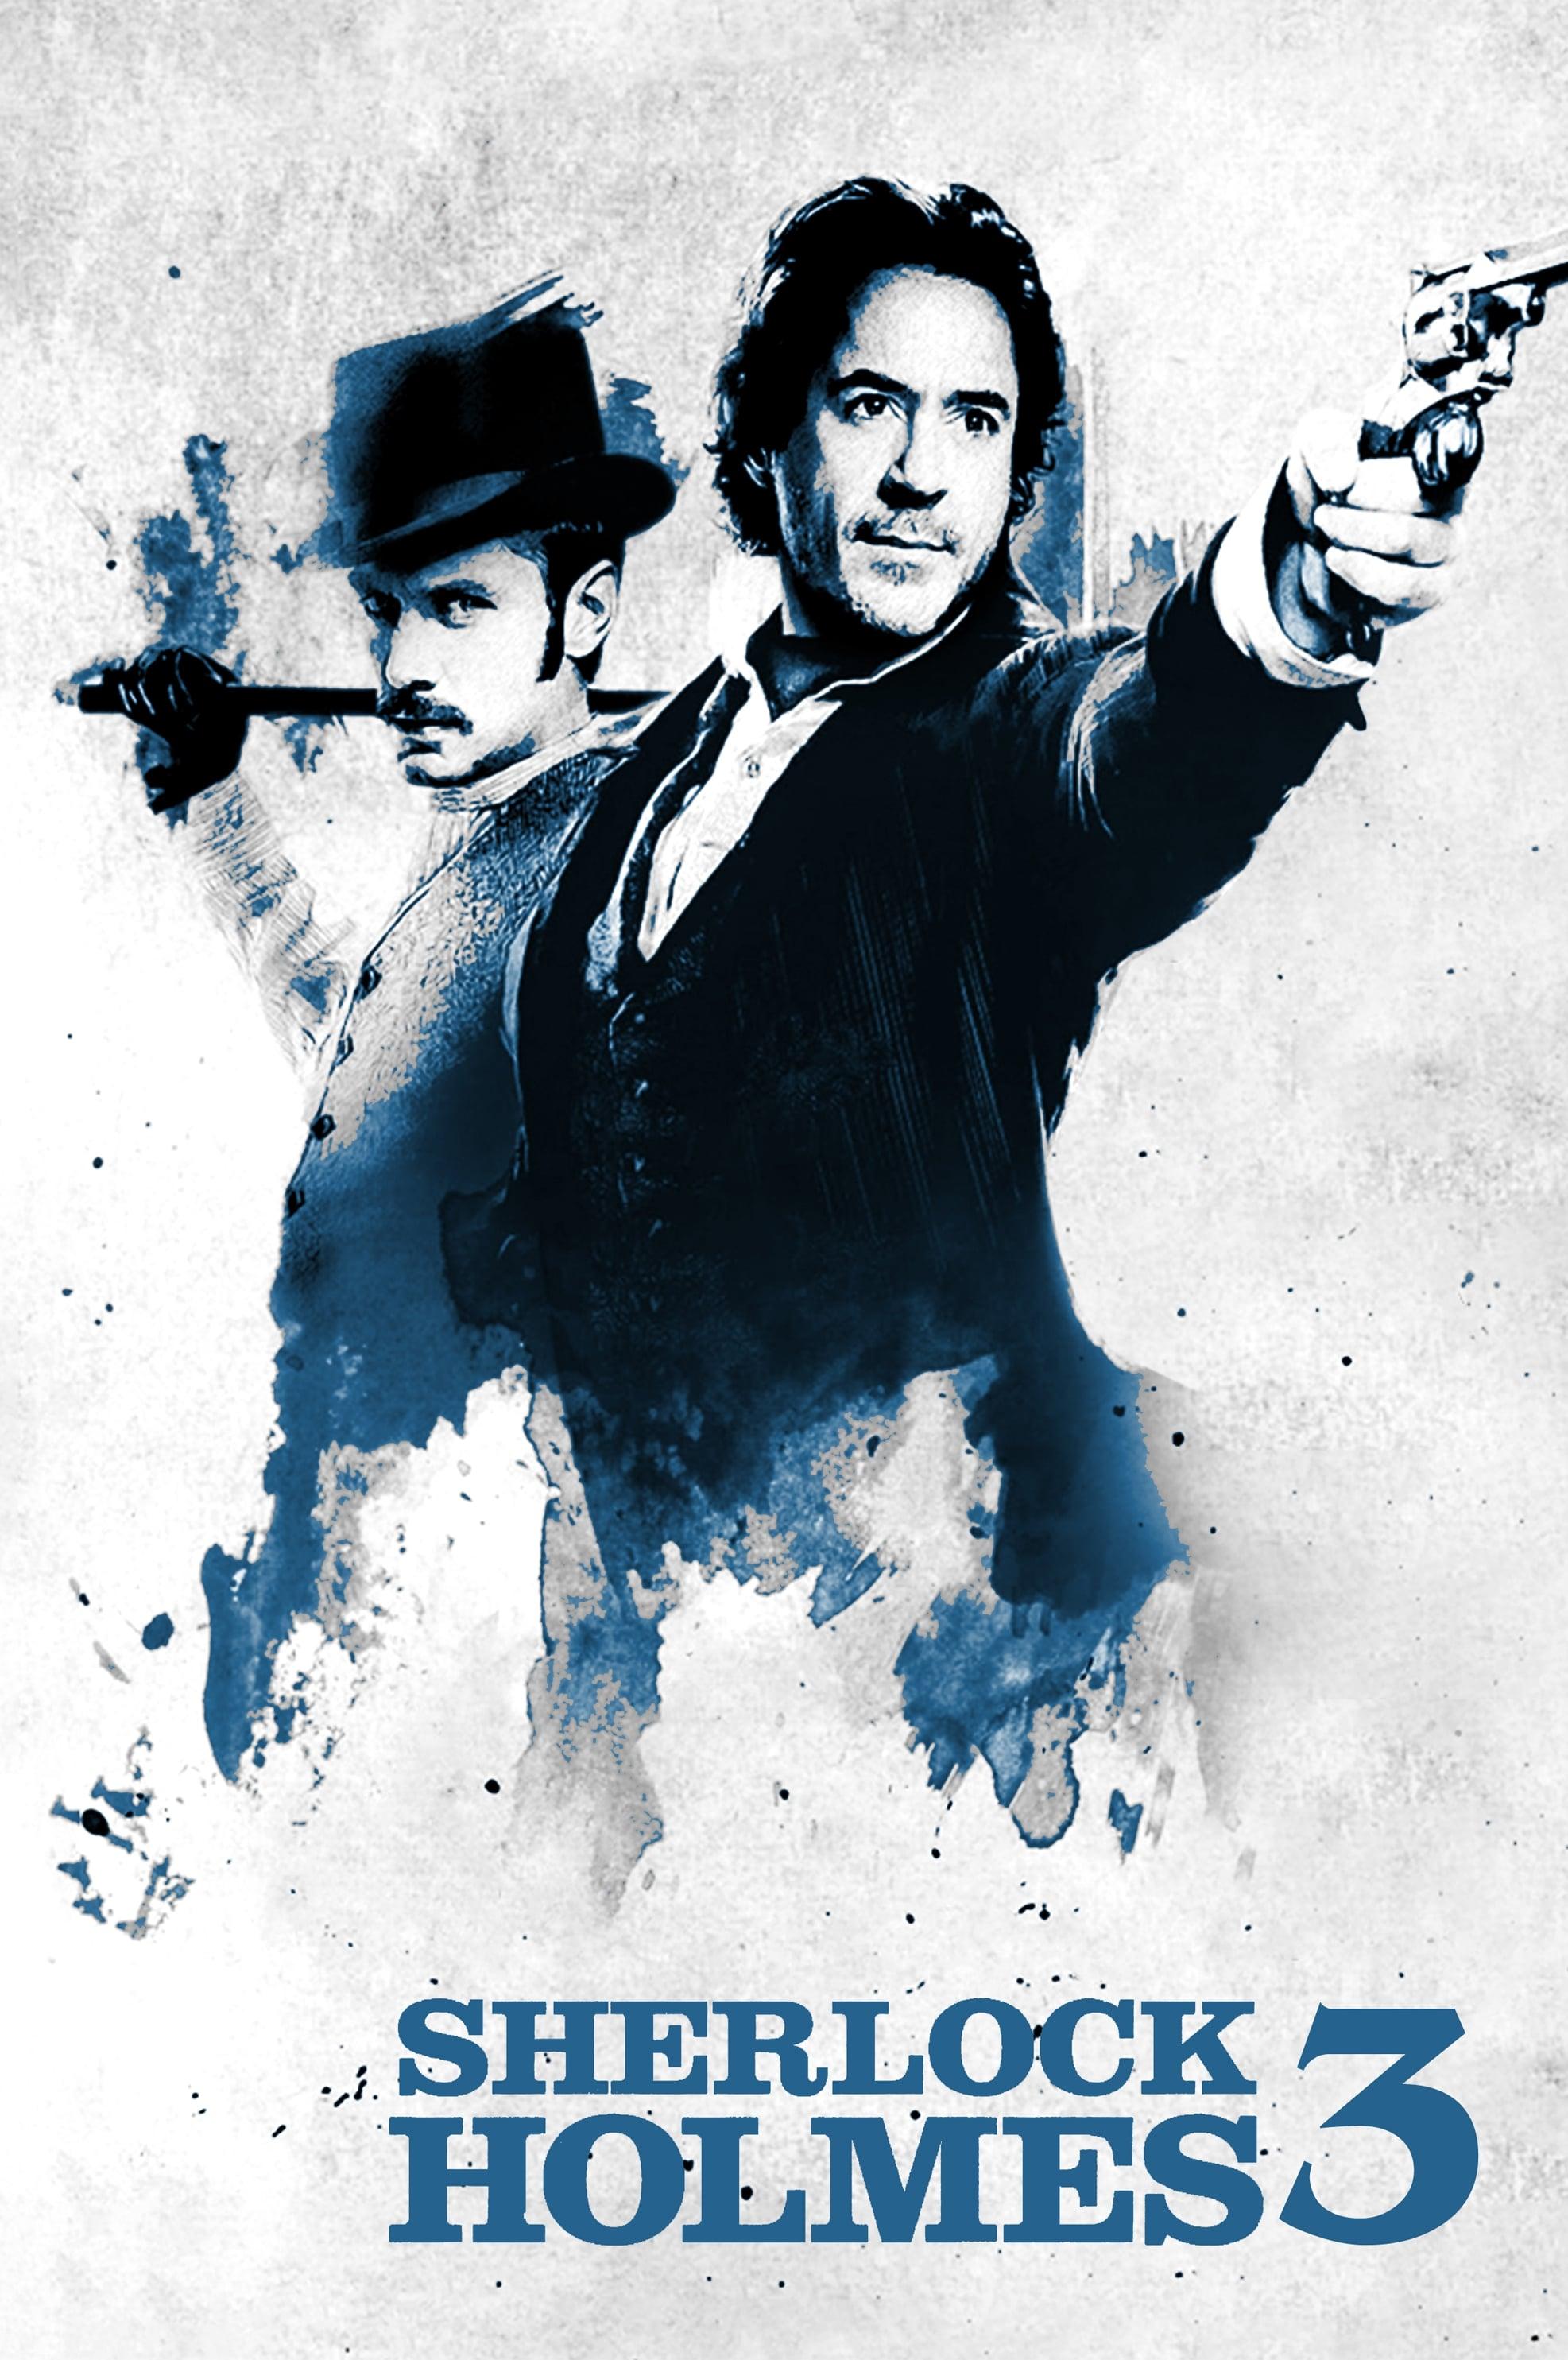 Sherlock Holmes 3 movie download